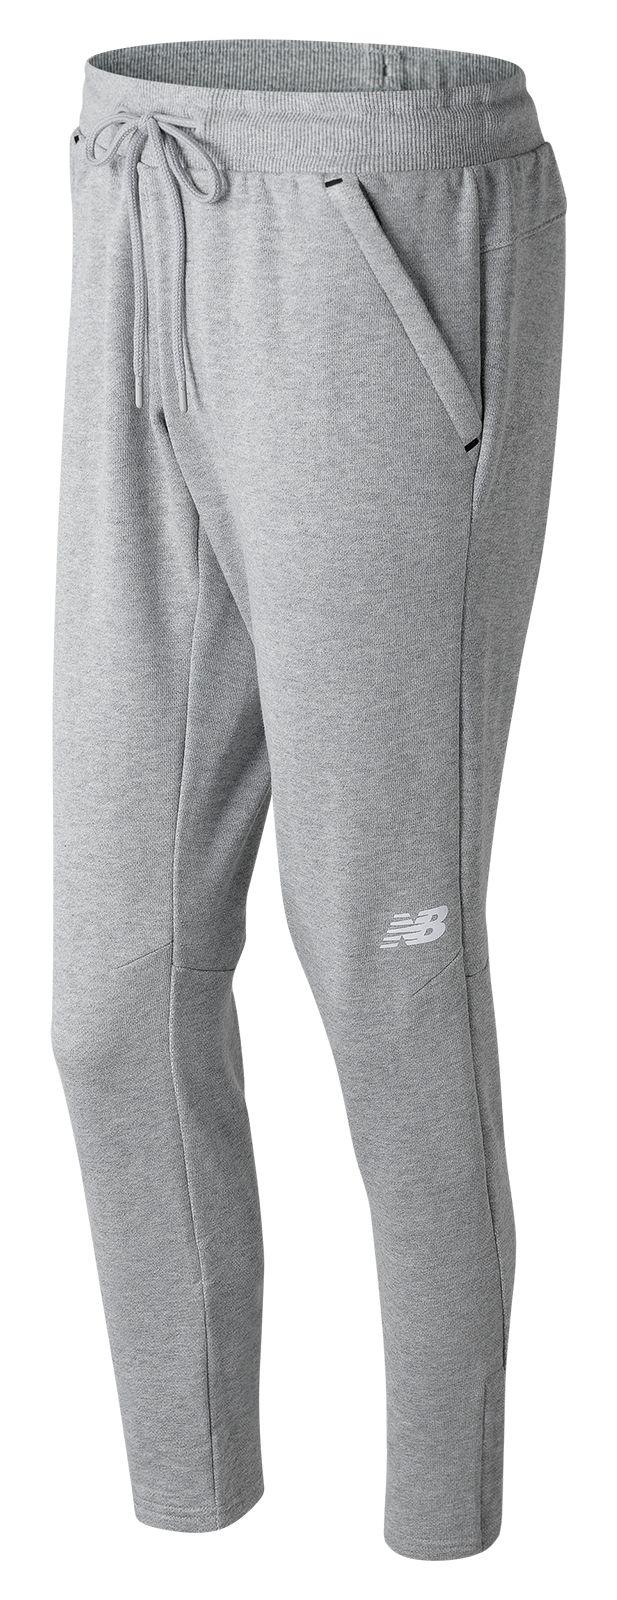 NB 247 Sport Sweatpant, Athletic Grey